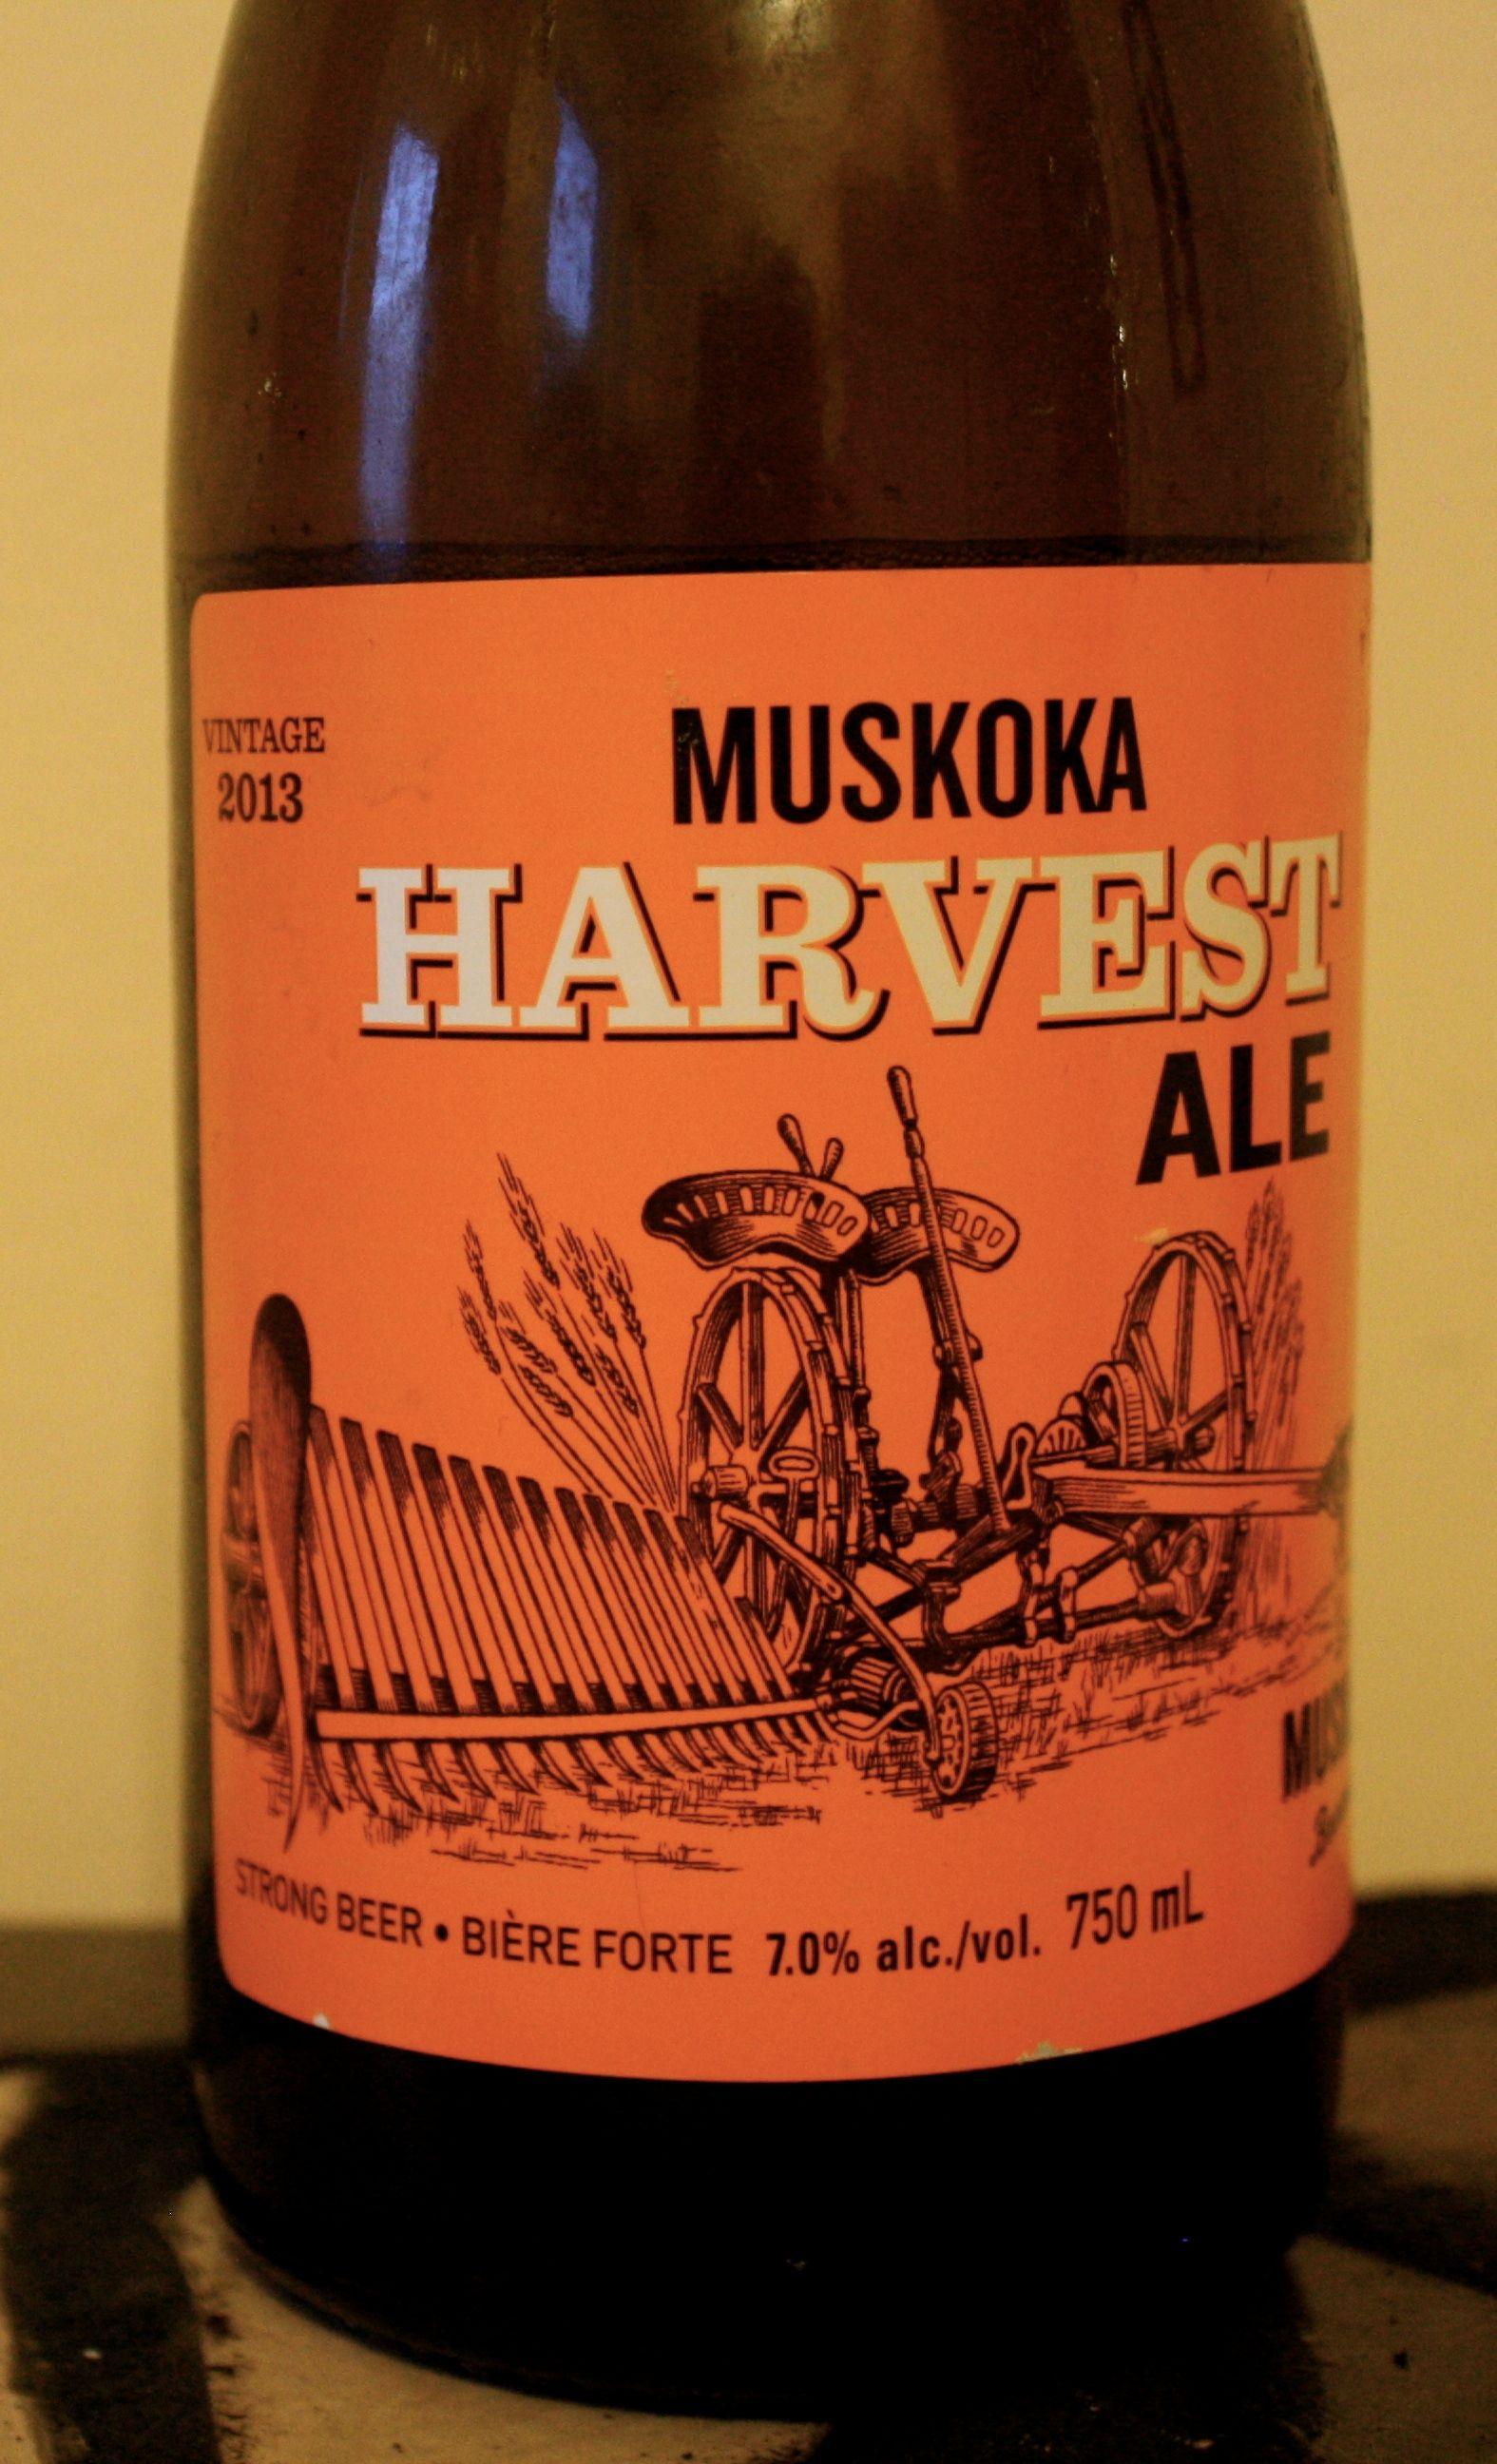 Muskoka Harvest Ale Is A American Pale Ale Apa Style Beer Brewed By Muskoka Brewery In Gravenhurst On Canada Bier Ale Speciaal Bier